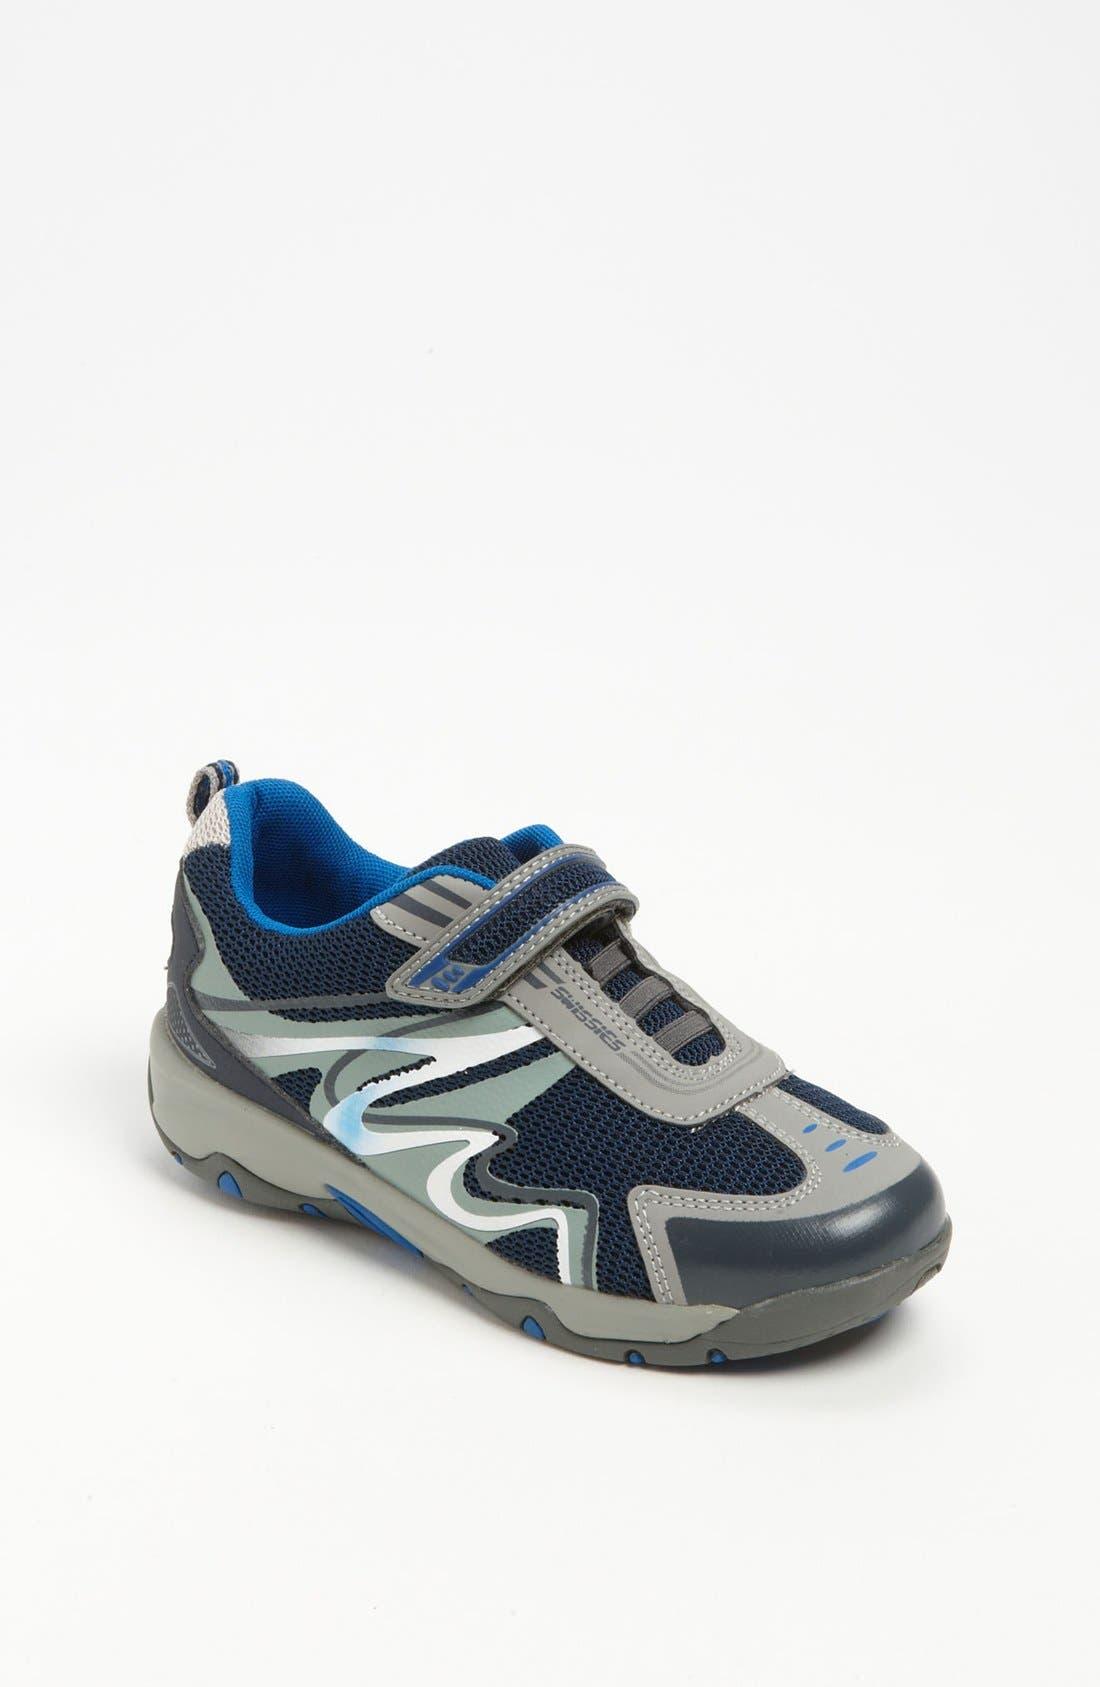 Main Image - Swissies 'Speed' Sneaker (Toddler & Little Kid)